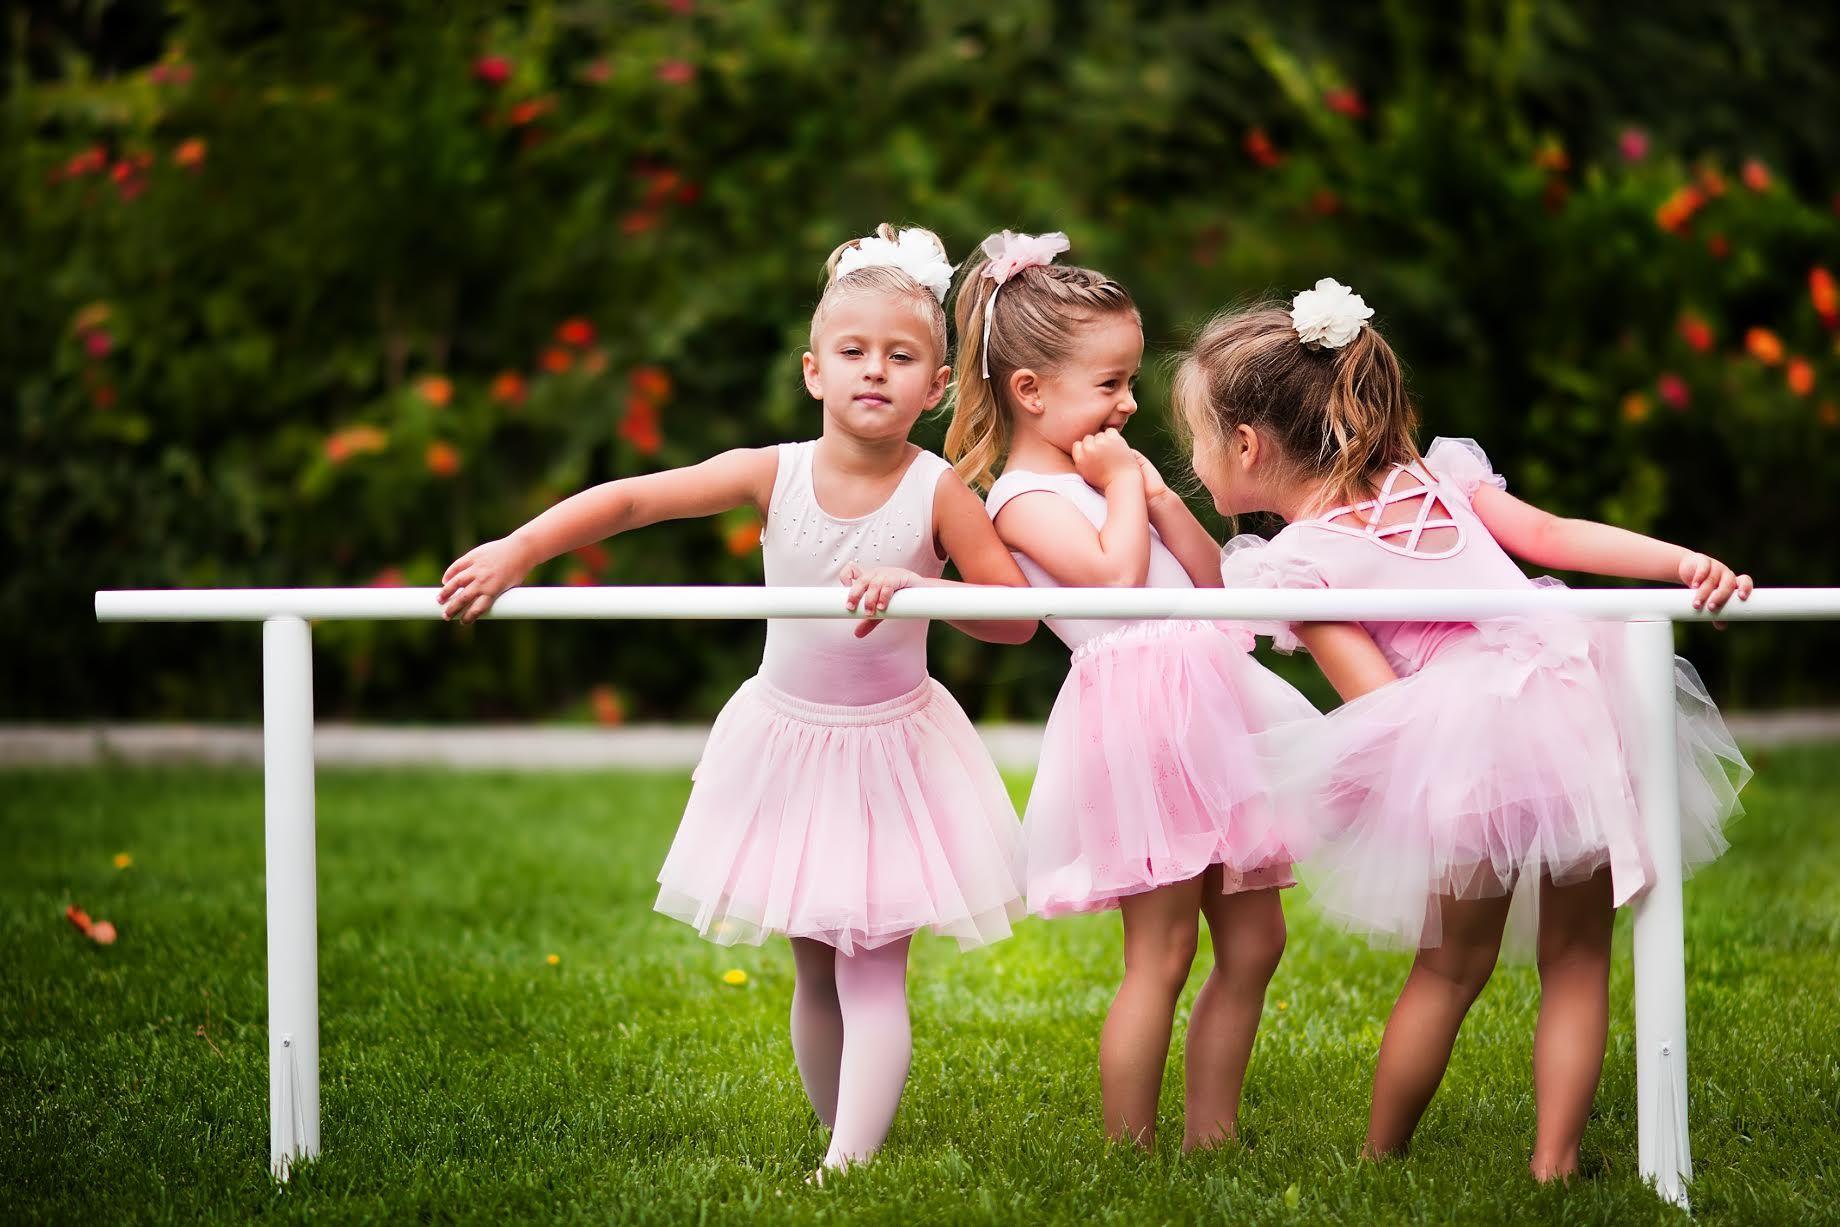 Картинки про танец детей